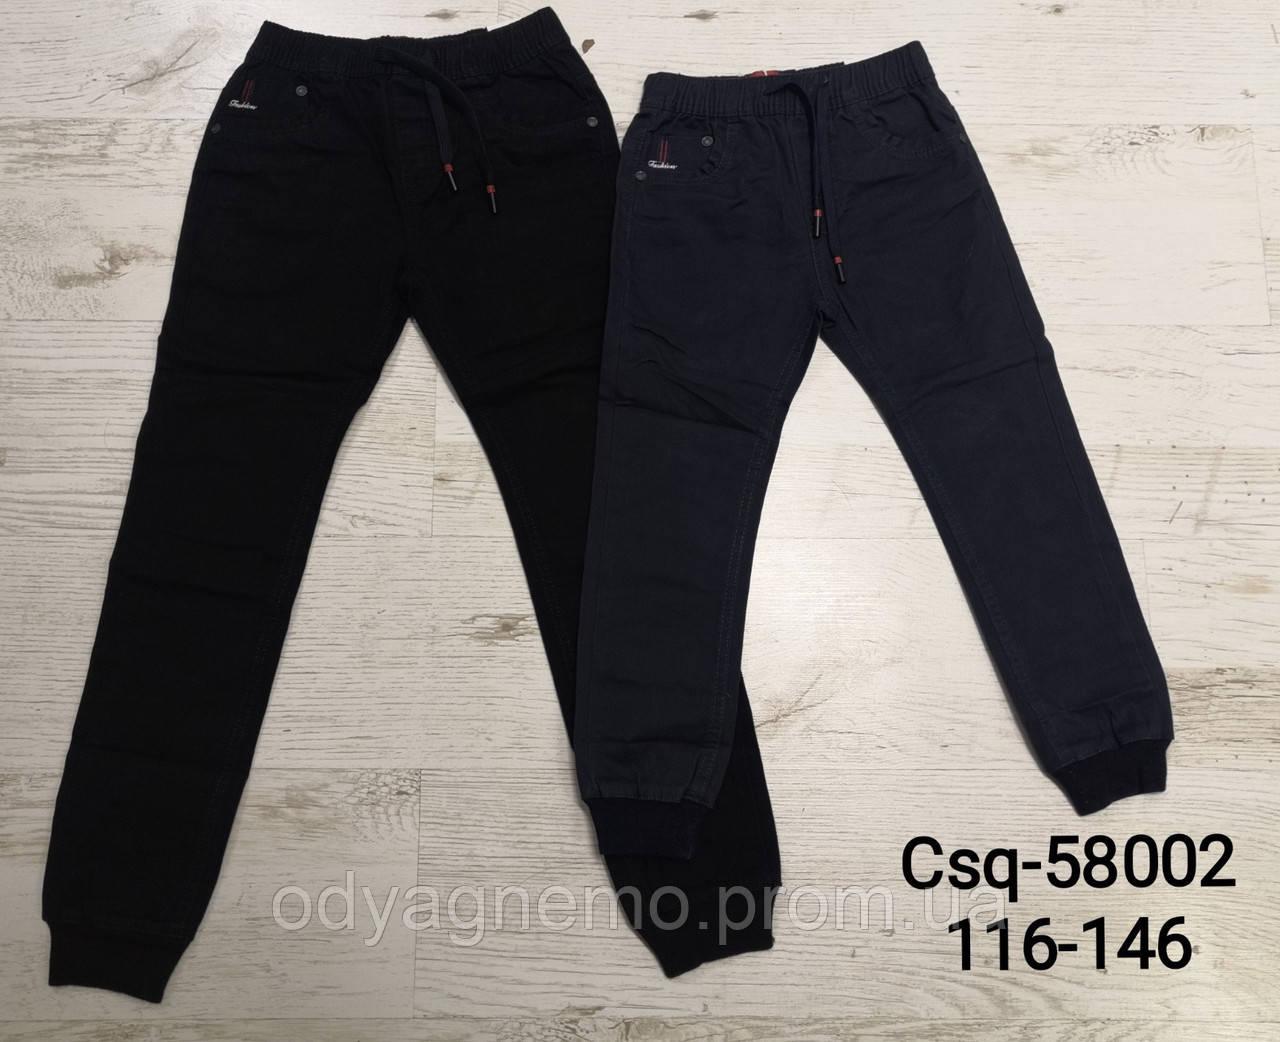 Котоновые брюки для мальчиков Seagull оптом, 116-146 рр. Артикул: CSQ58002